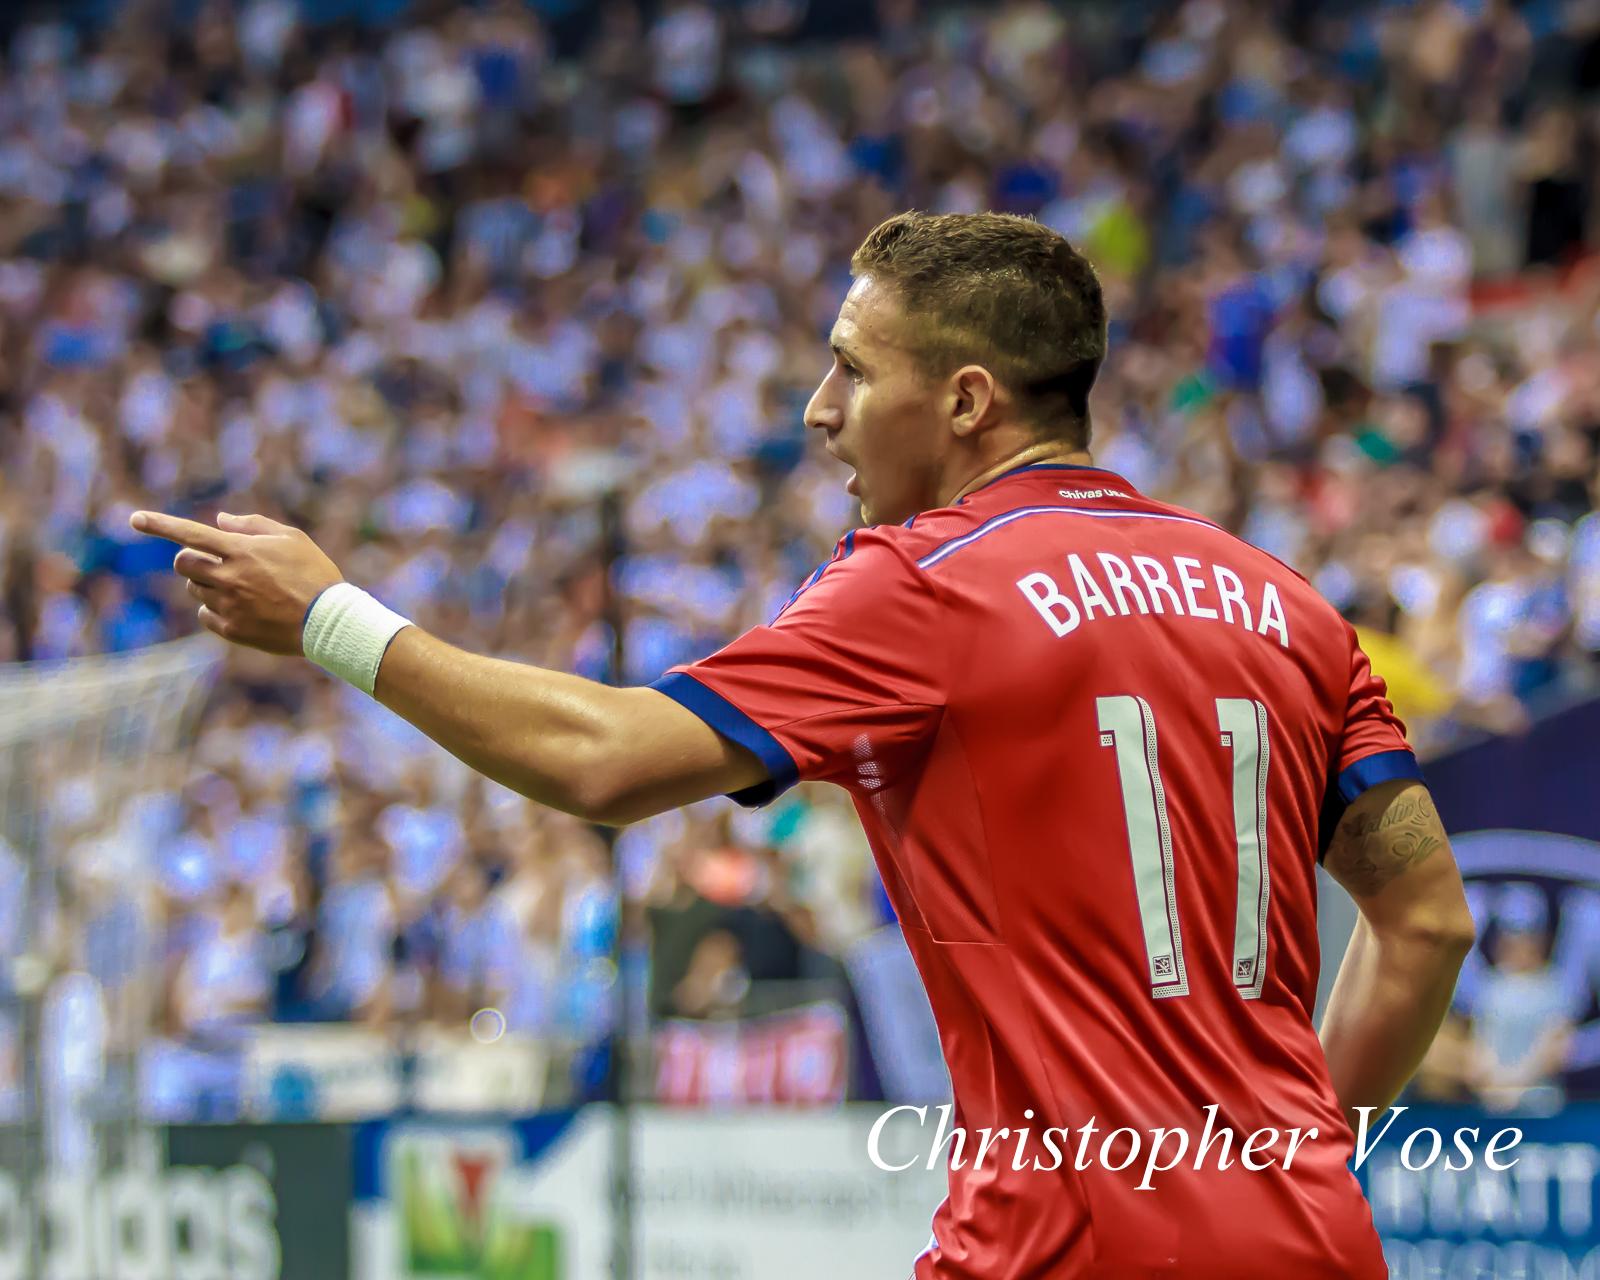 2014-07-12 Leandro Barrera Goal Celebration 1.jpg